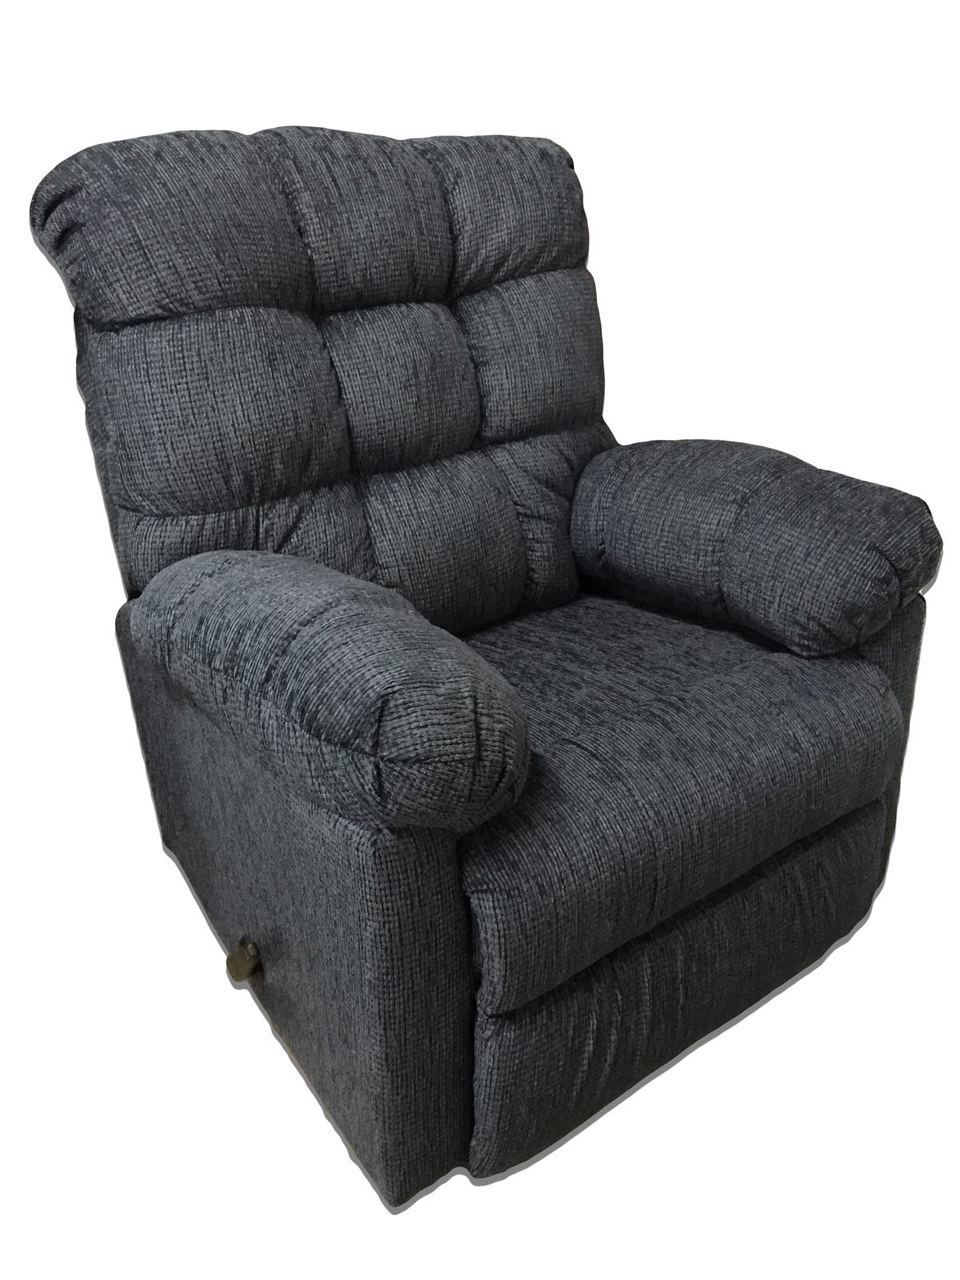 Rocker Recliners Radar Blue 399.00 OAK 400RCL Furniture